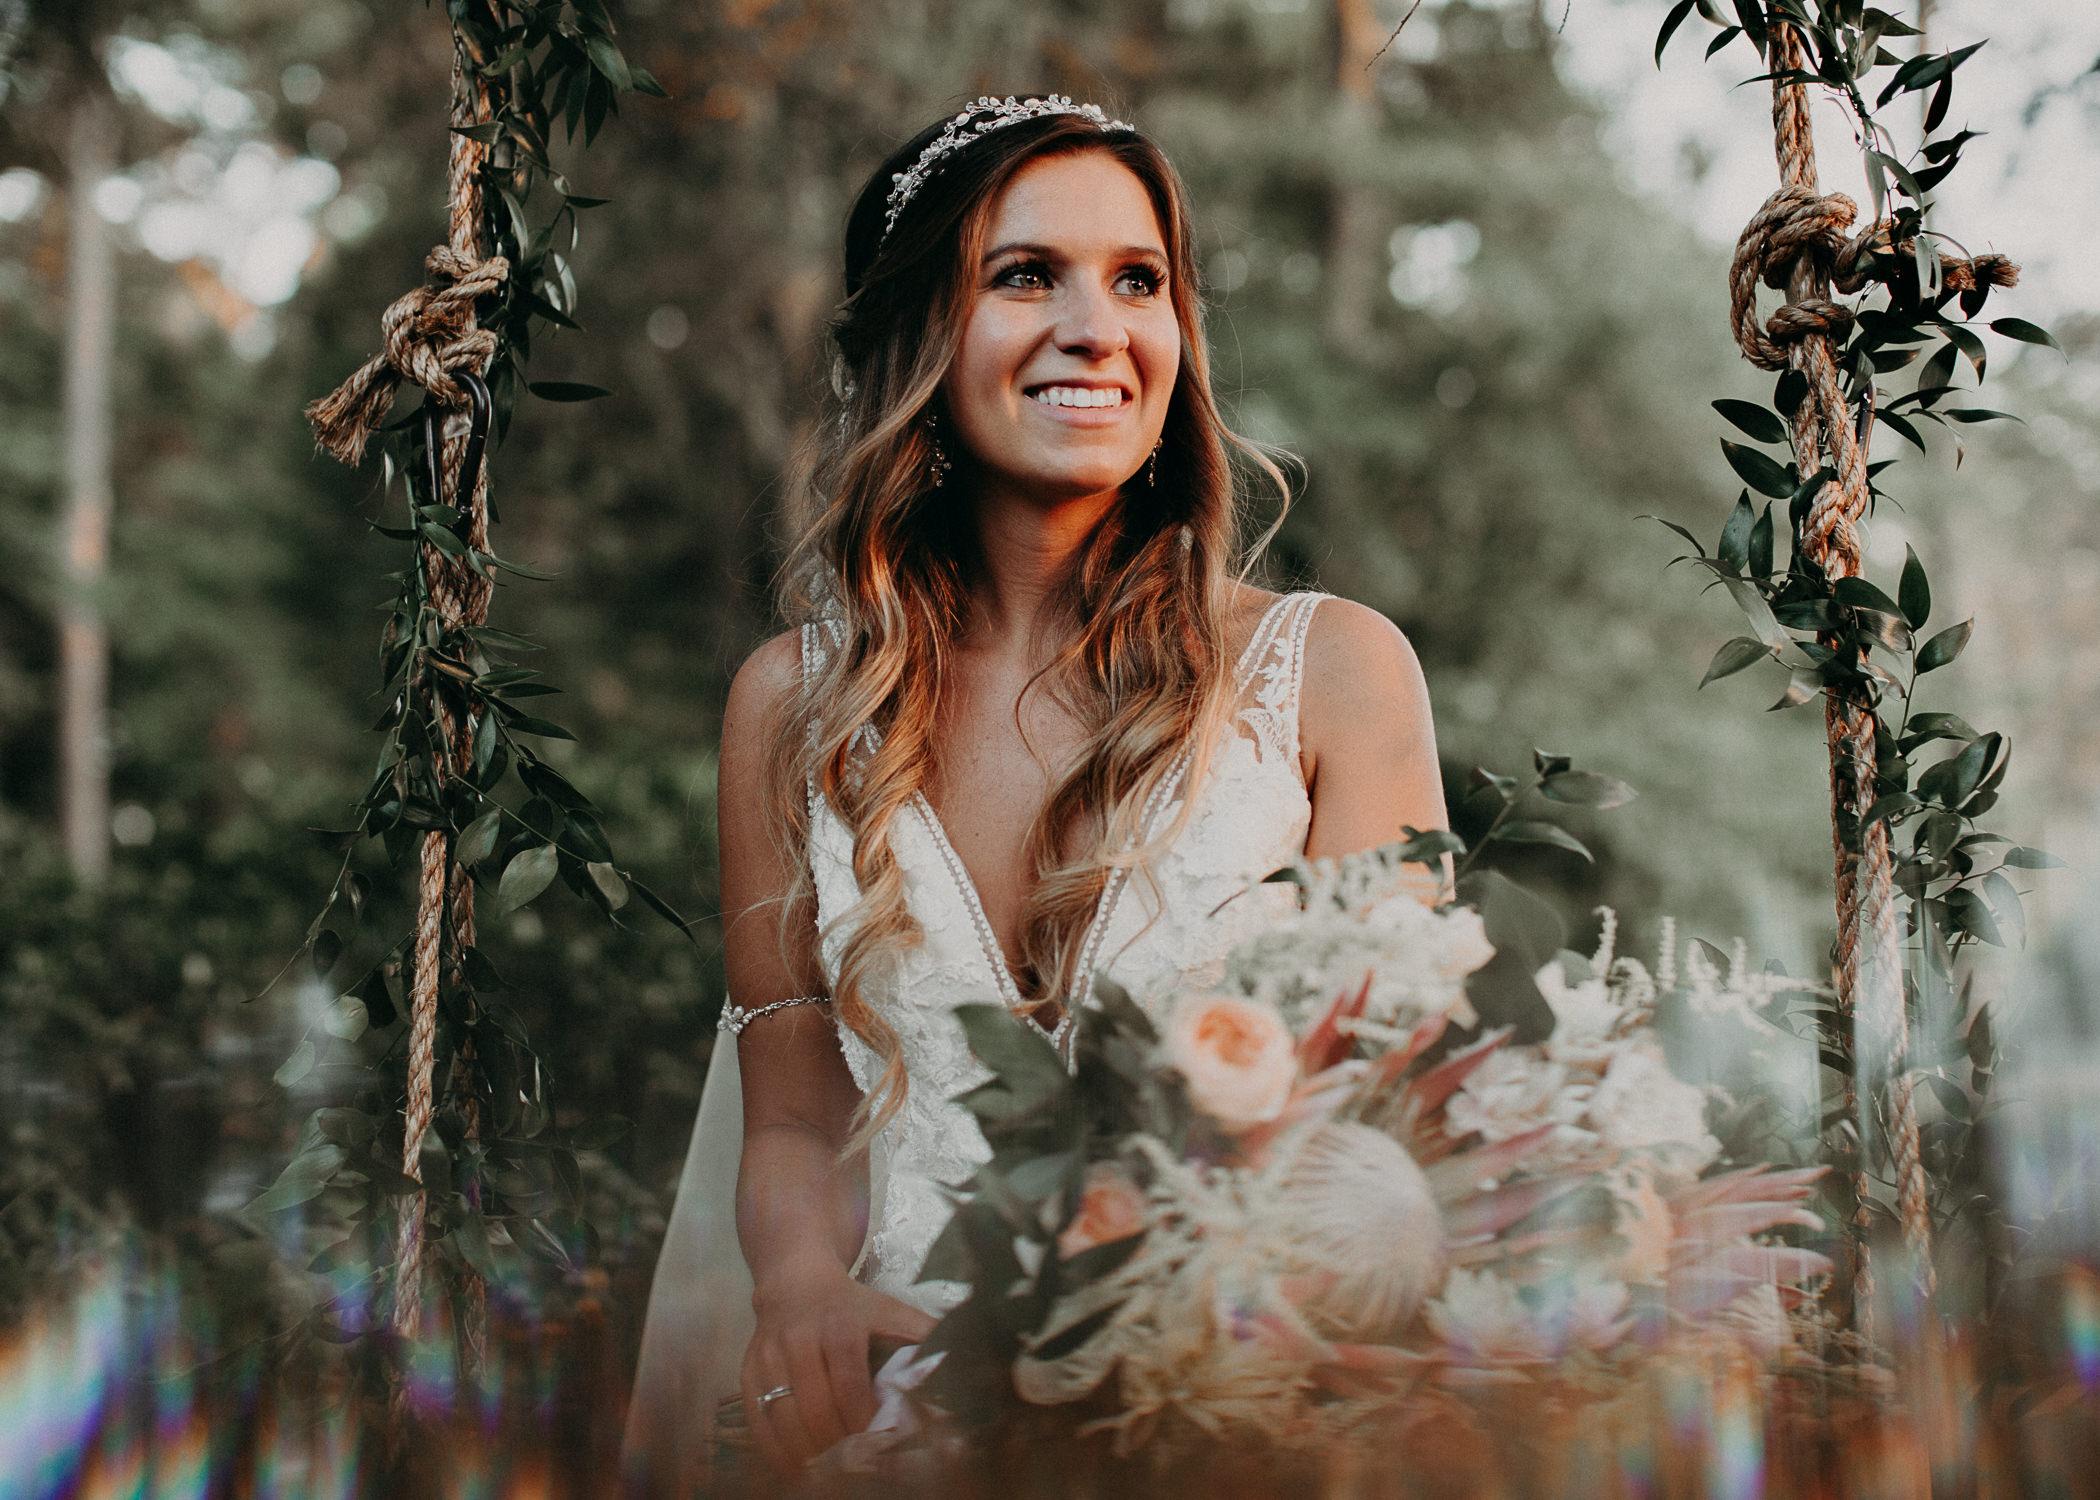 84Carl House Wedding Venue Ga, Atlanta Wedding Photographer - Boho, Bohemian, Junebug Weddings, Vintage, Retro, Trendy. Aline Marin Photography. .jpg